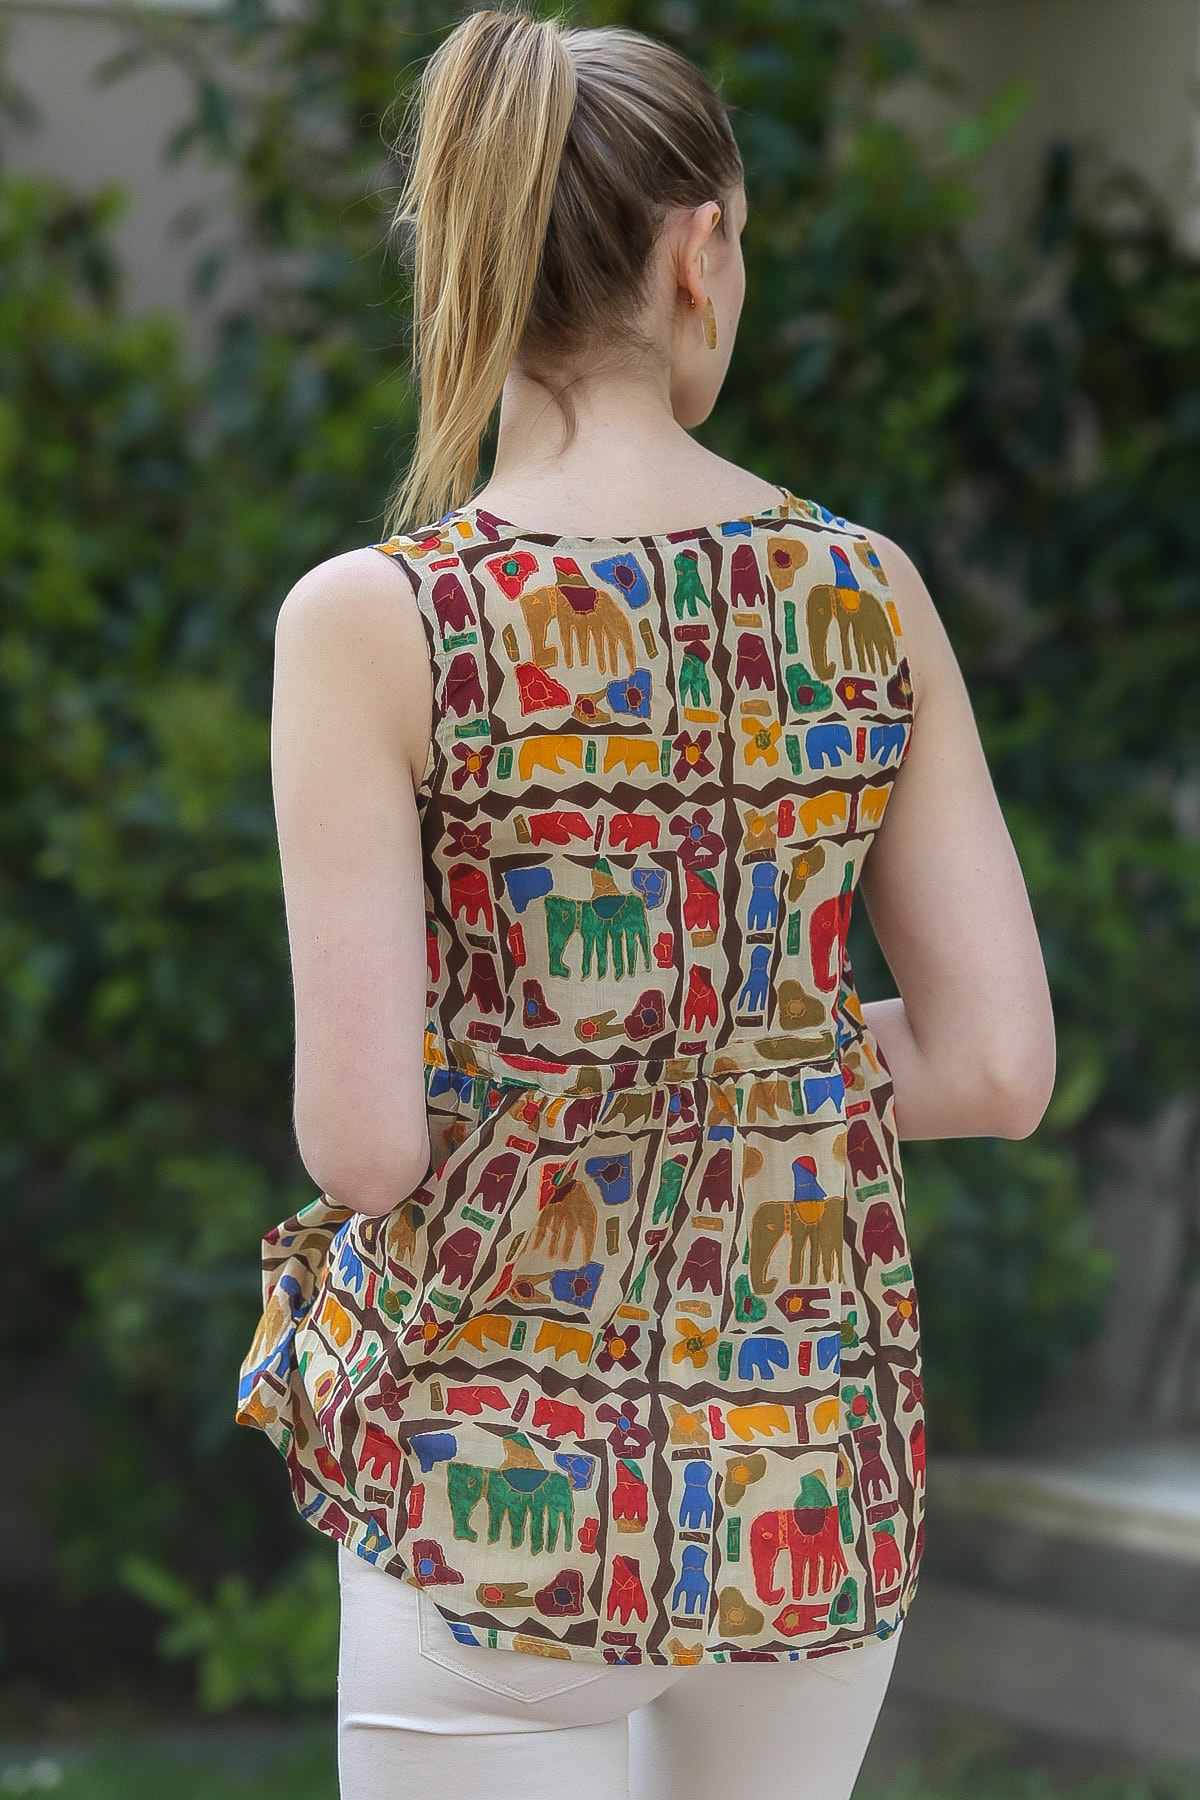 Chiccy Kadın Bej Sıfır Yaka Kolsuz Robası Büzgülü Fil Desenli Dokuma Bluz M10010200BL95381 4